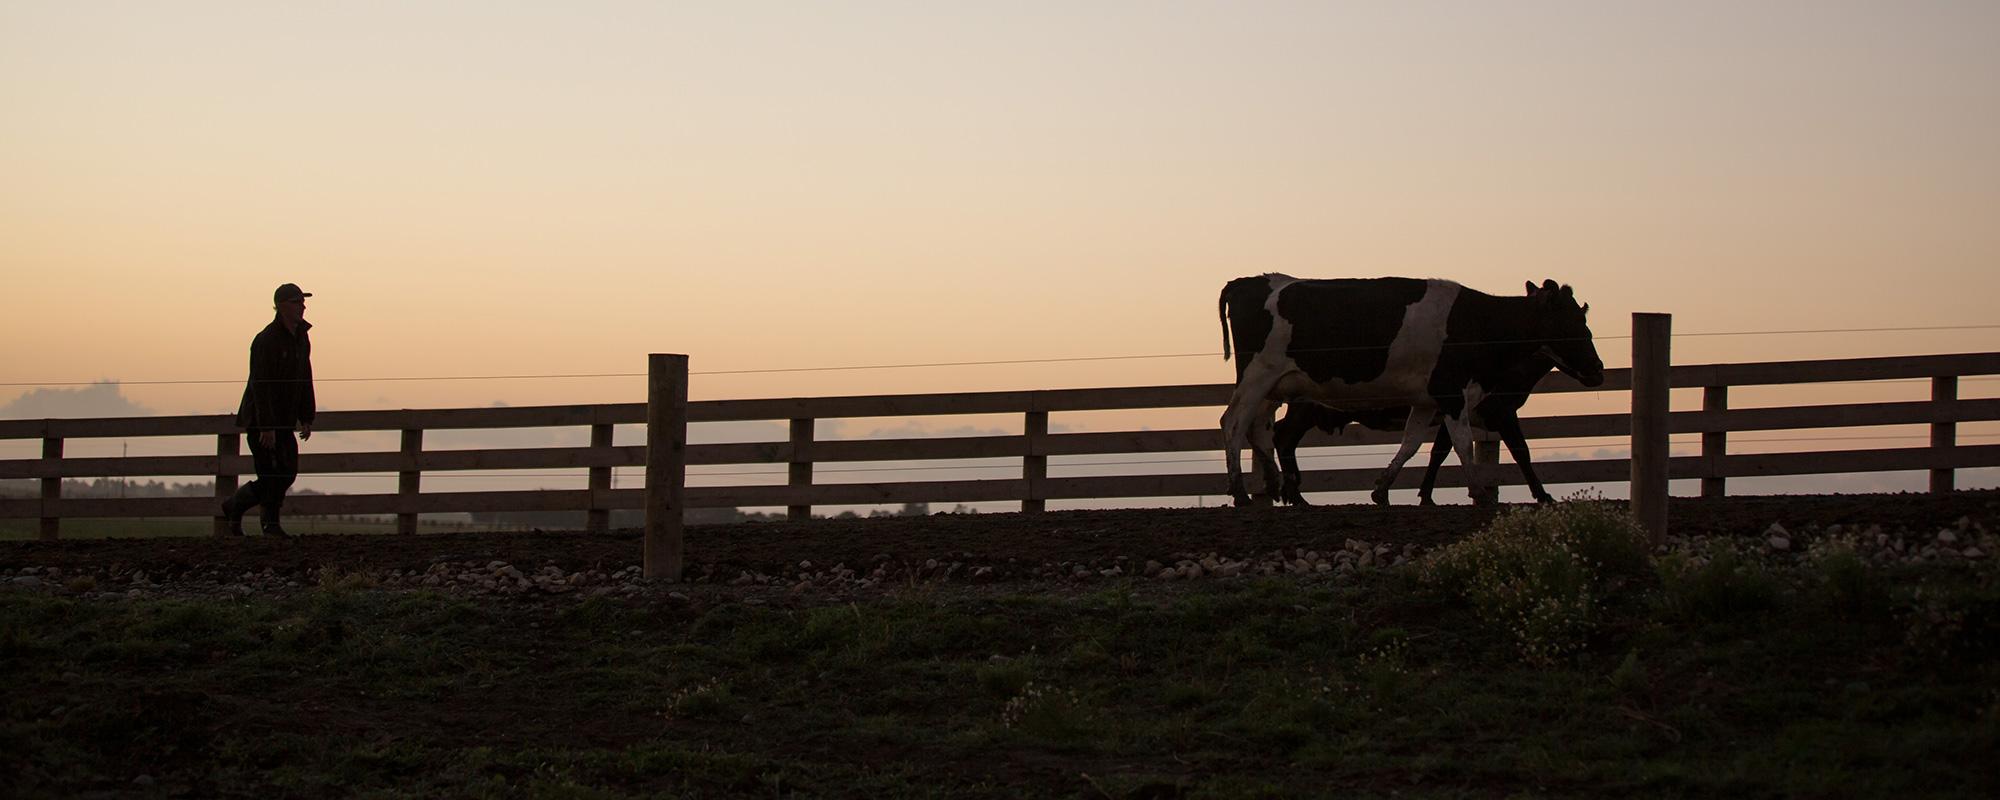 The global farmland story